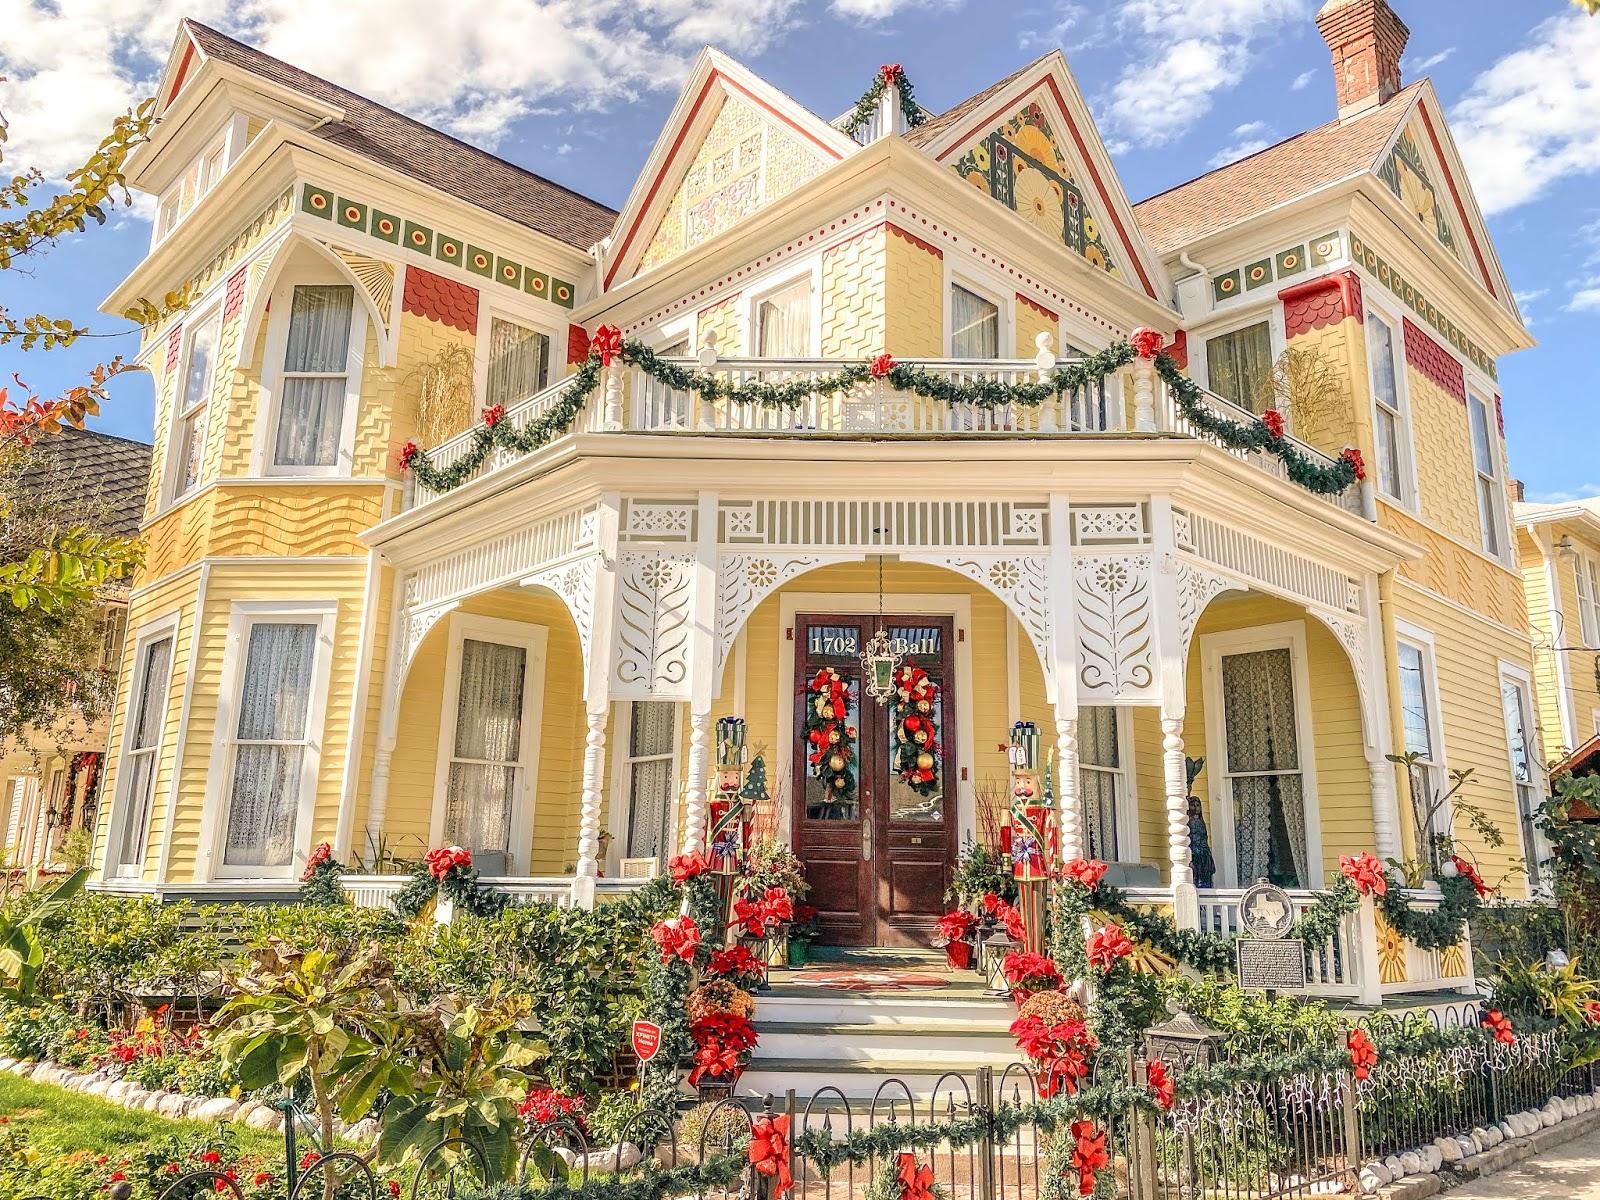 Victorian House on Ball St. in Galveston